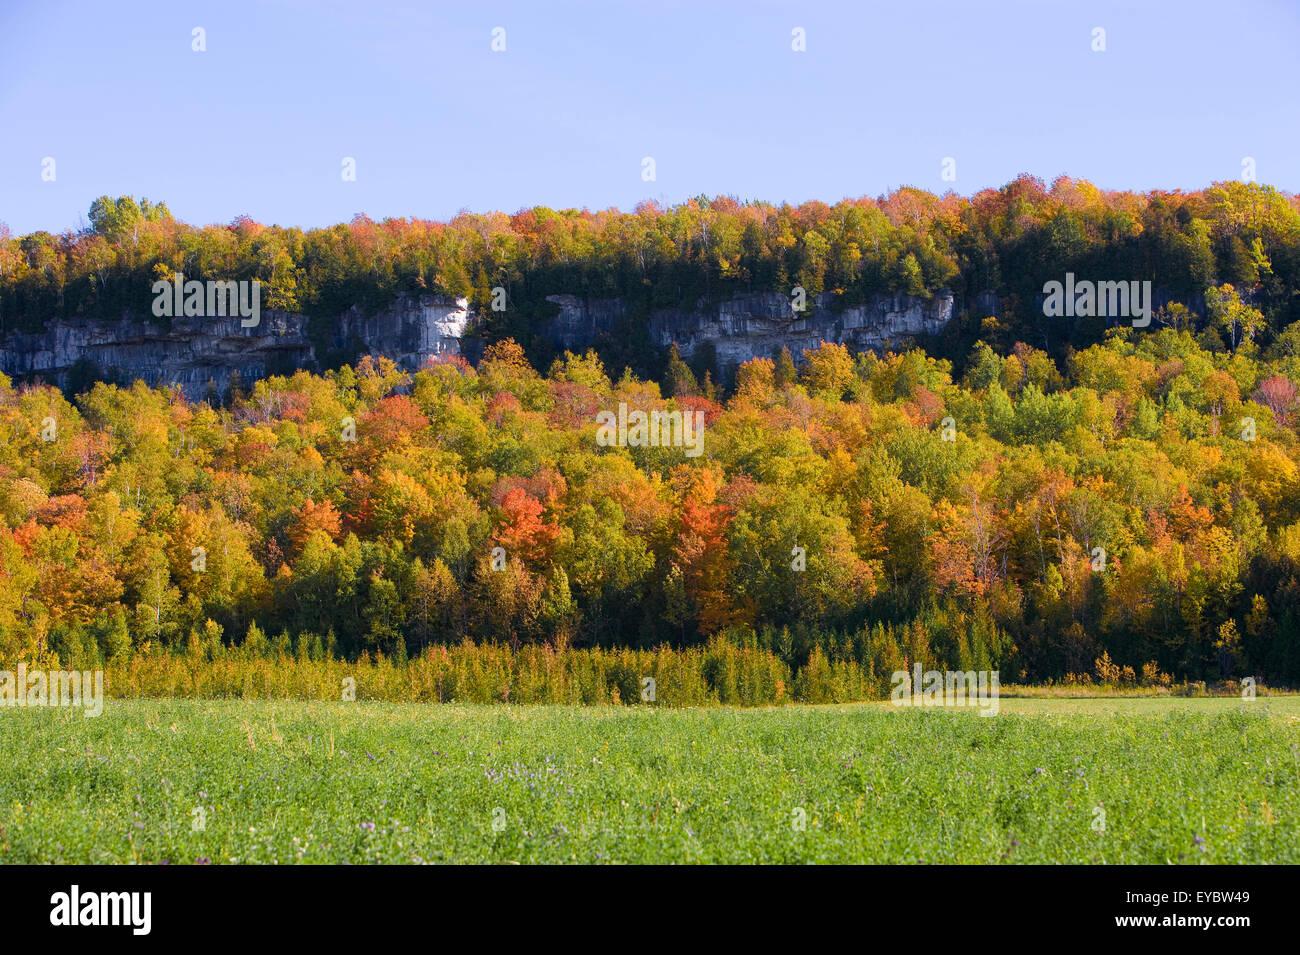 North America, Canada, Ontario, near Wiarton 'Bruce Peninsula' 'Niagara Escarpment' named in 1990 - Stock Image